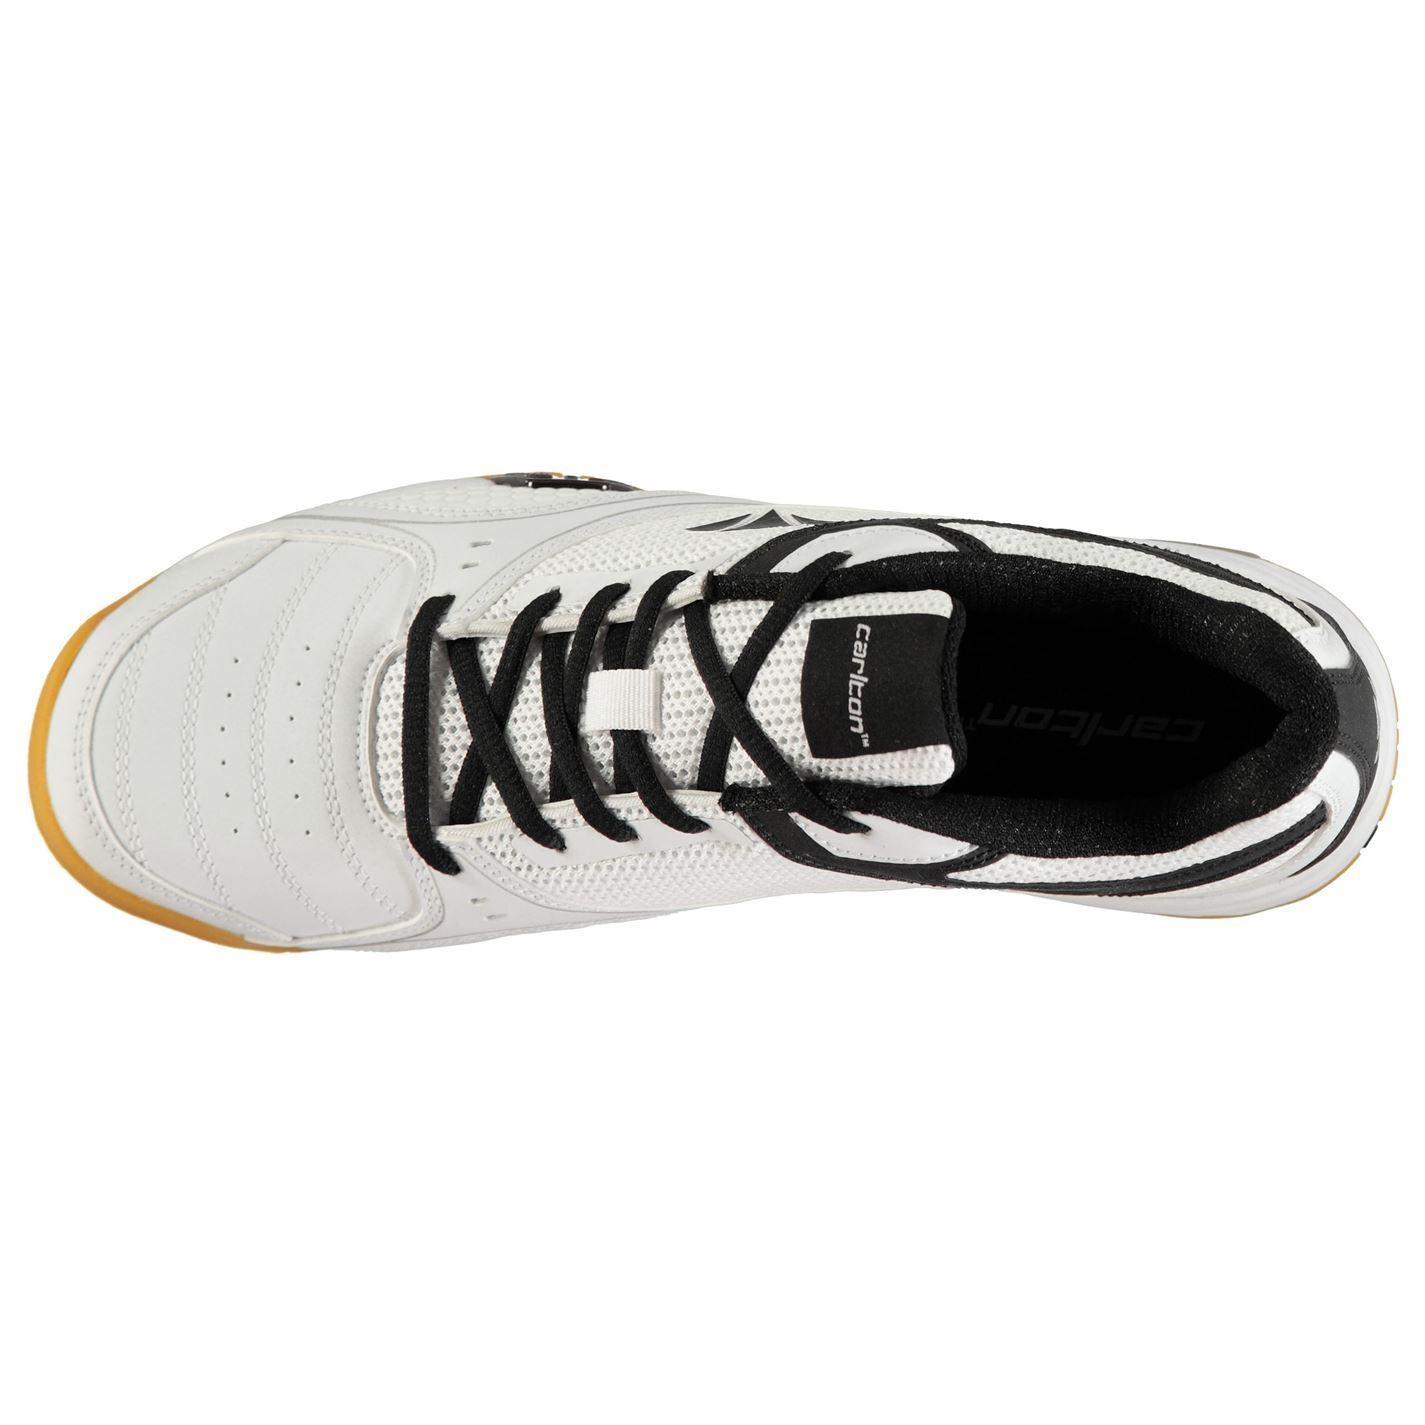 Carlton Mens Airblade Tour Court Shoes